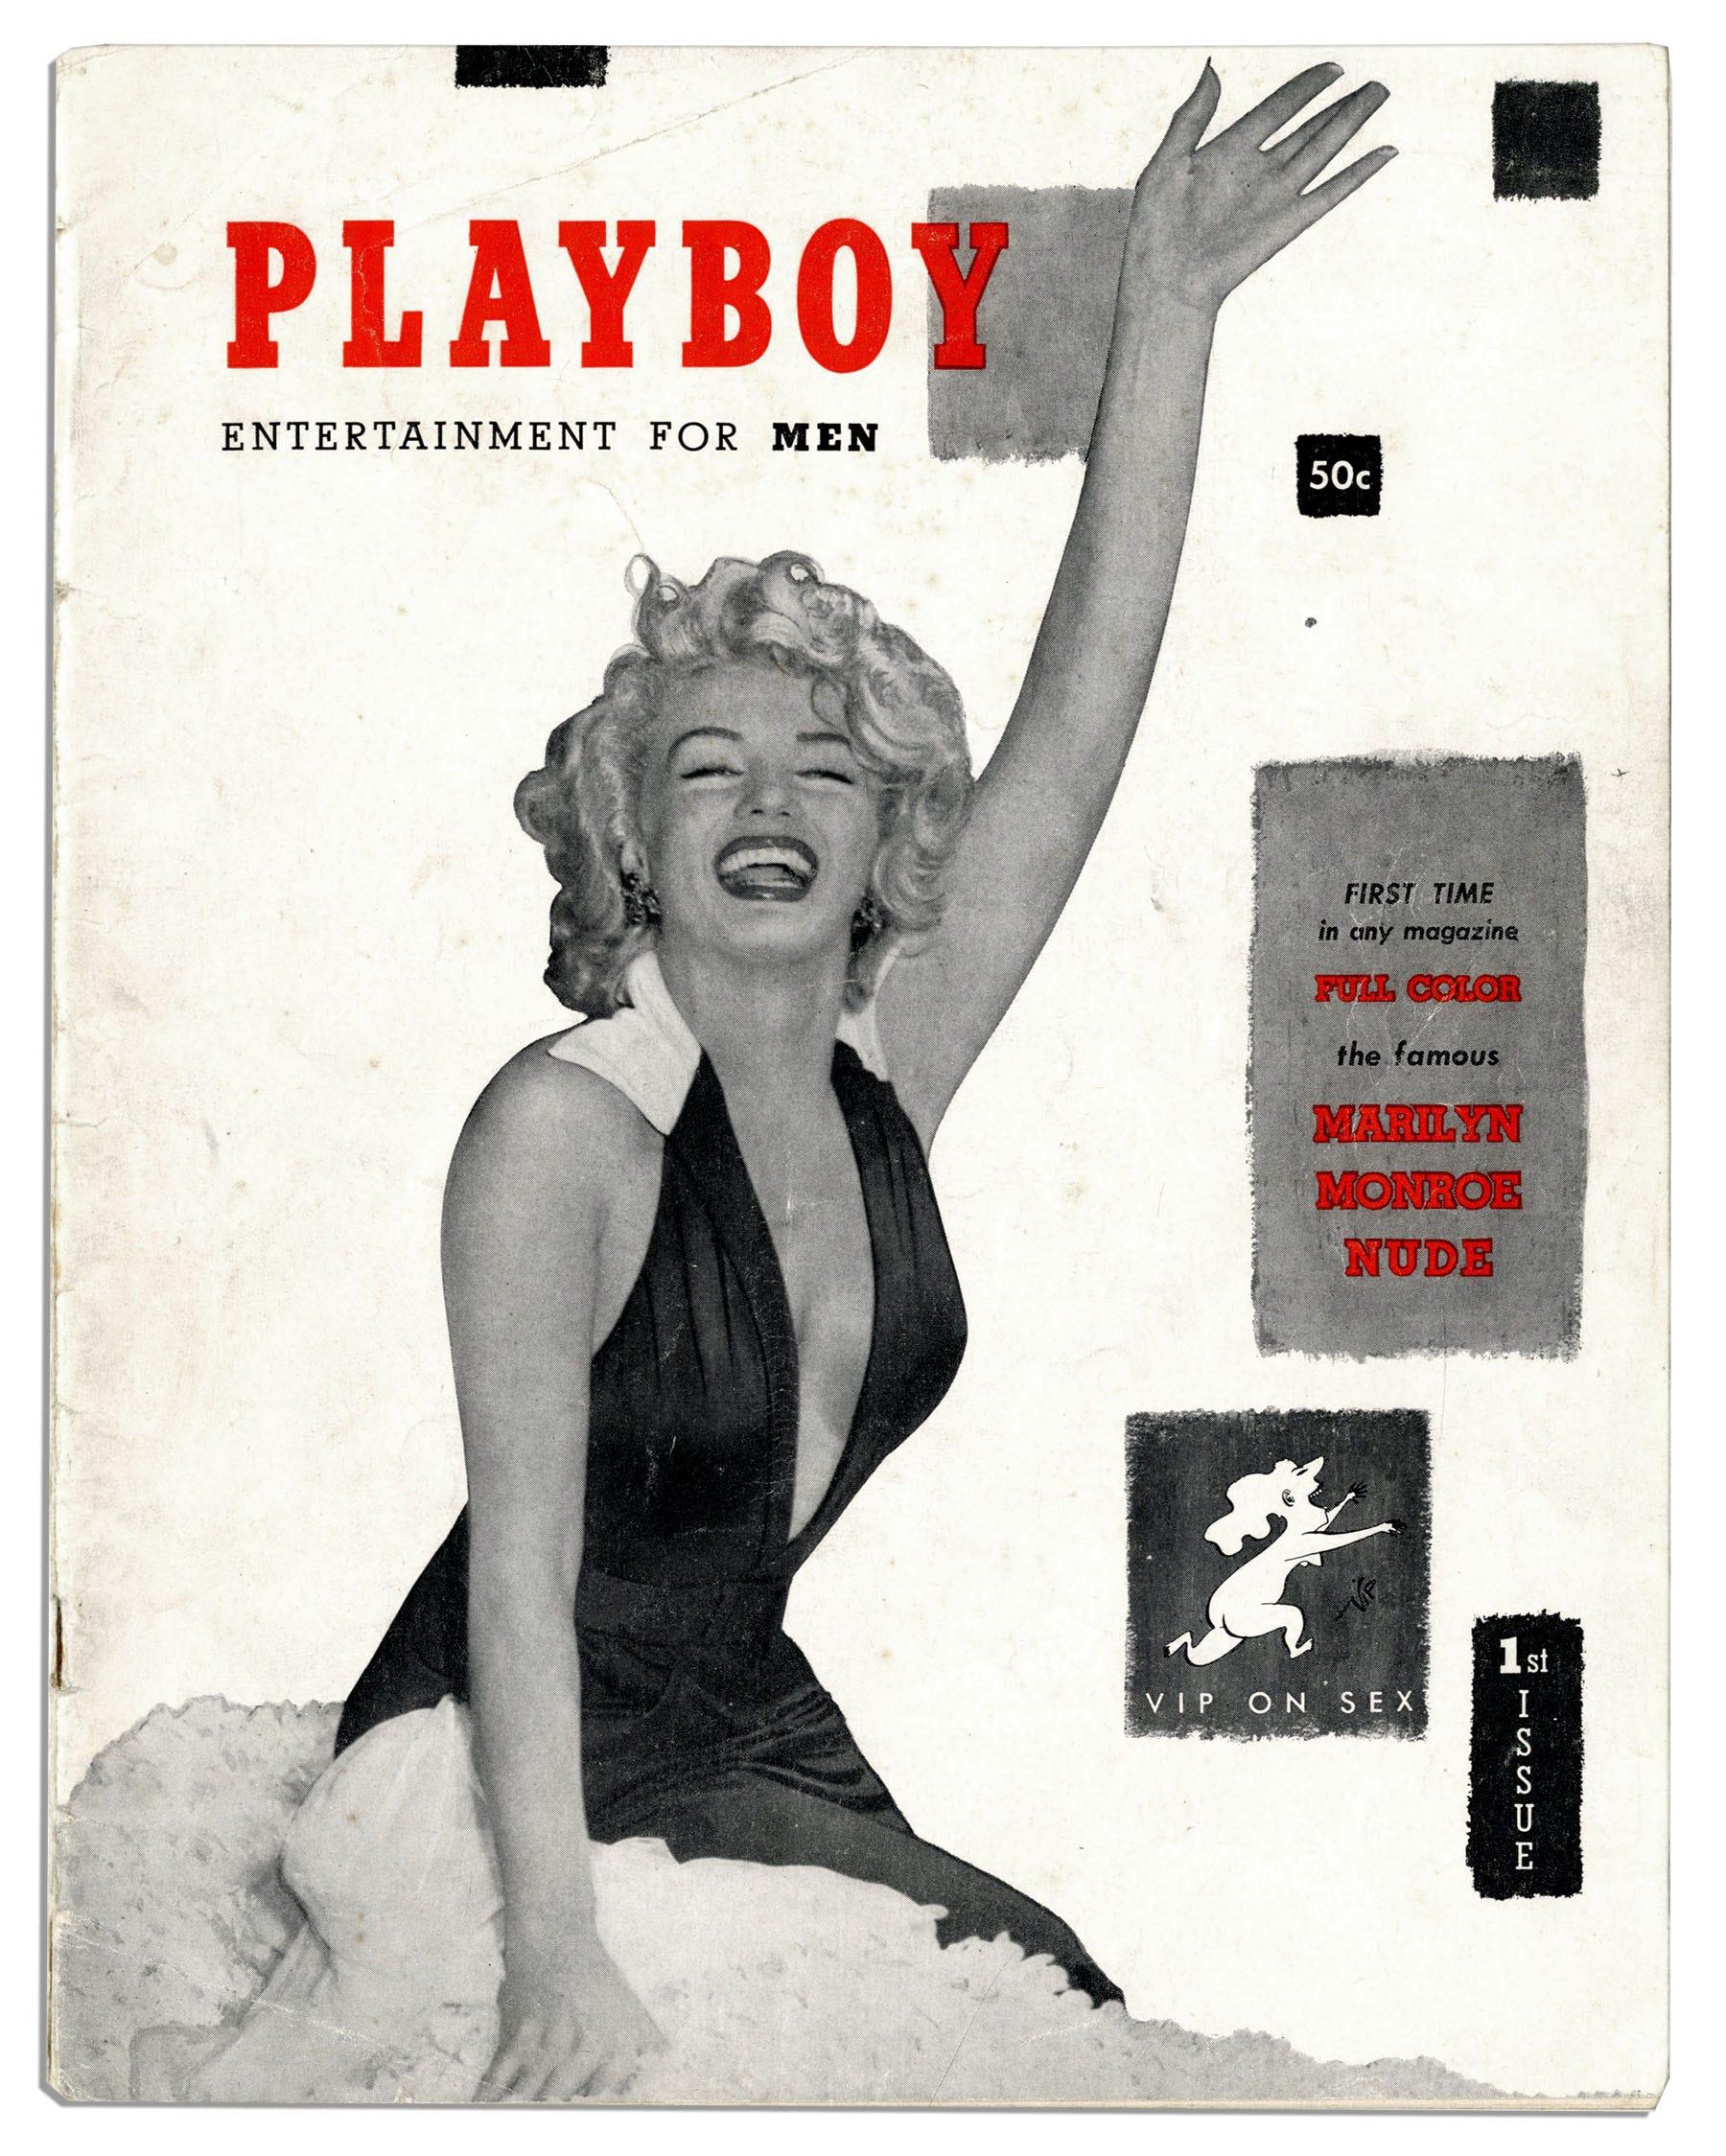 American Playboy  The Hugh Hefner Story Made Me See Playboy In A Different  Light. Hugh Hefner American Playboy Nude Magazine Story Review